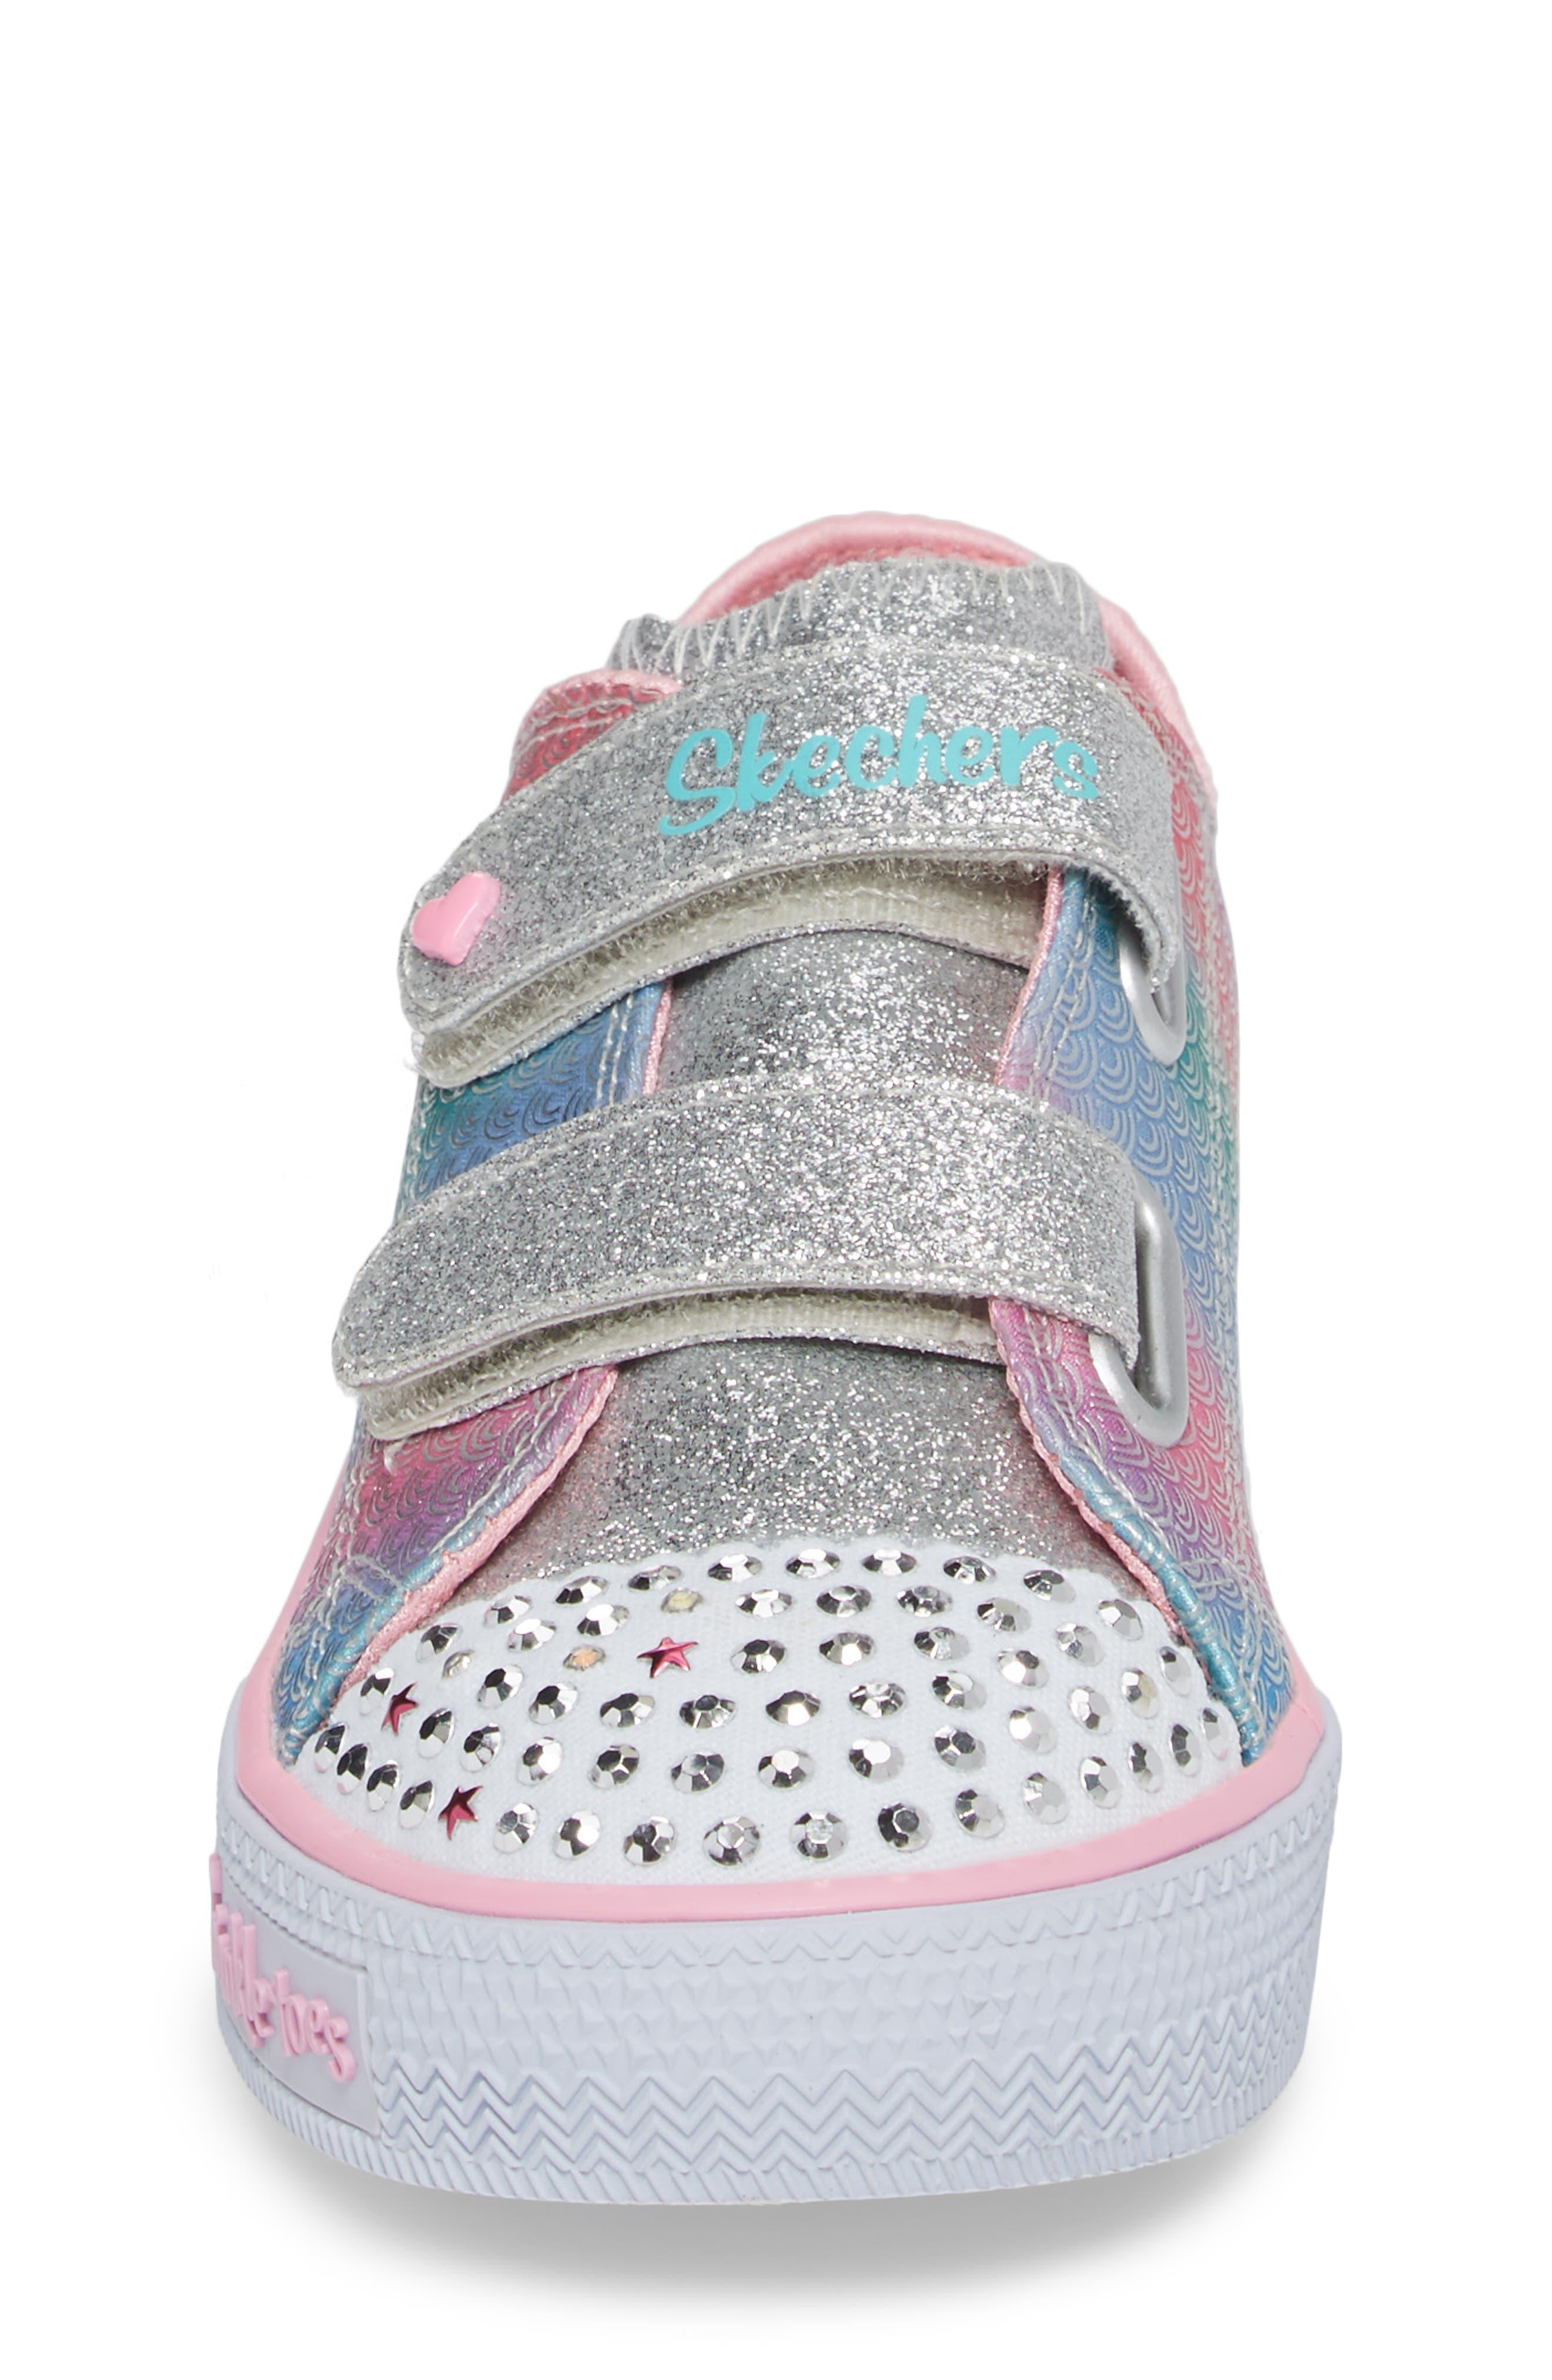 Shuffles - Itsy Bitsy Light-Up Sneaker,                             Alternate thumbnail 4, color,                             Silver/ Multi